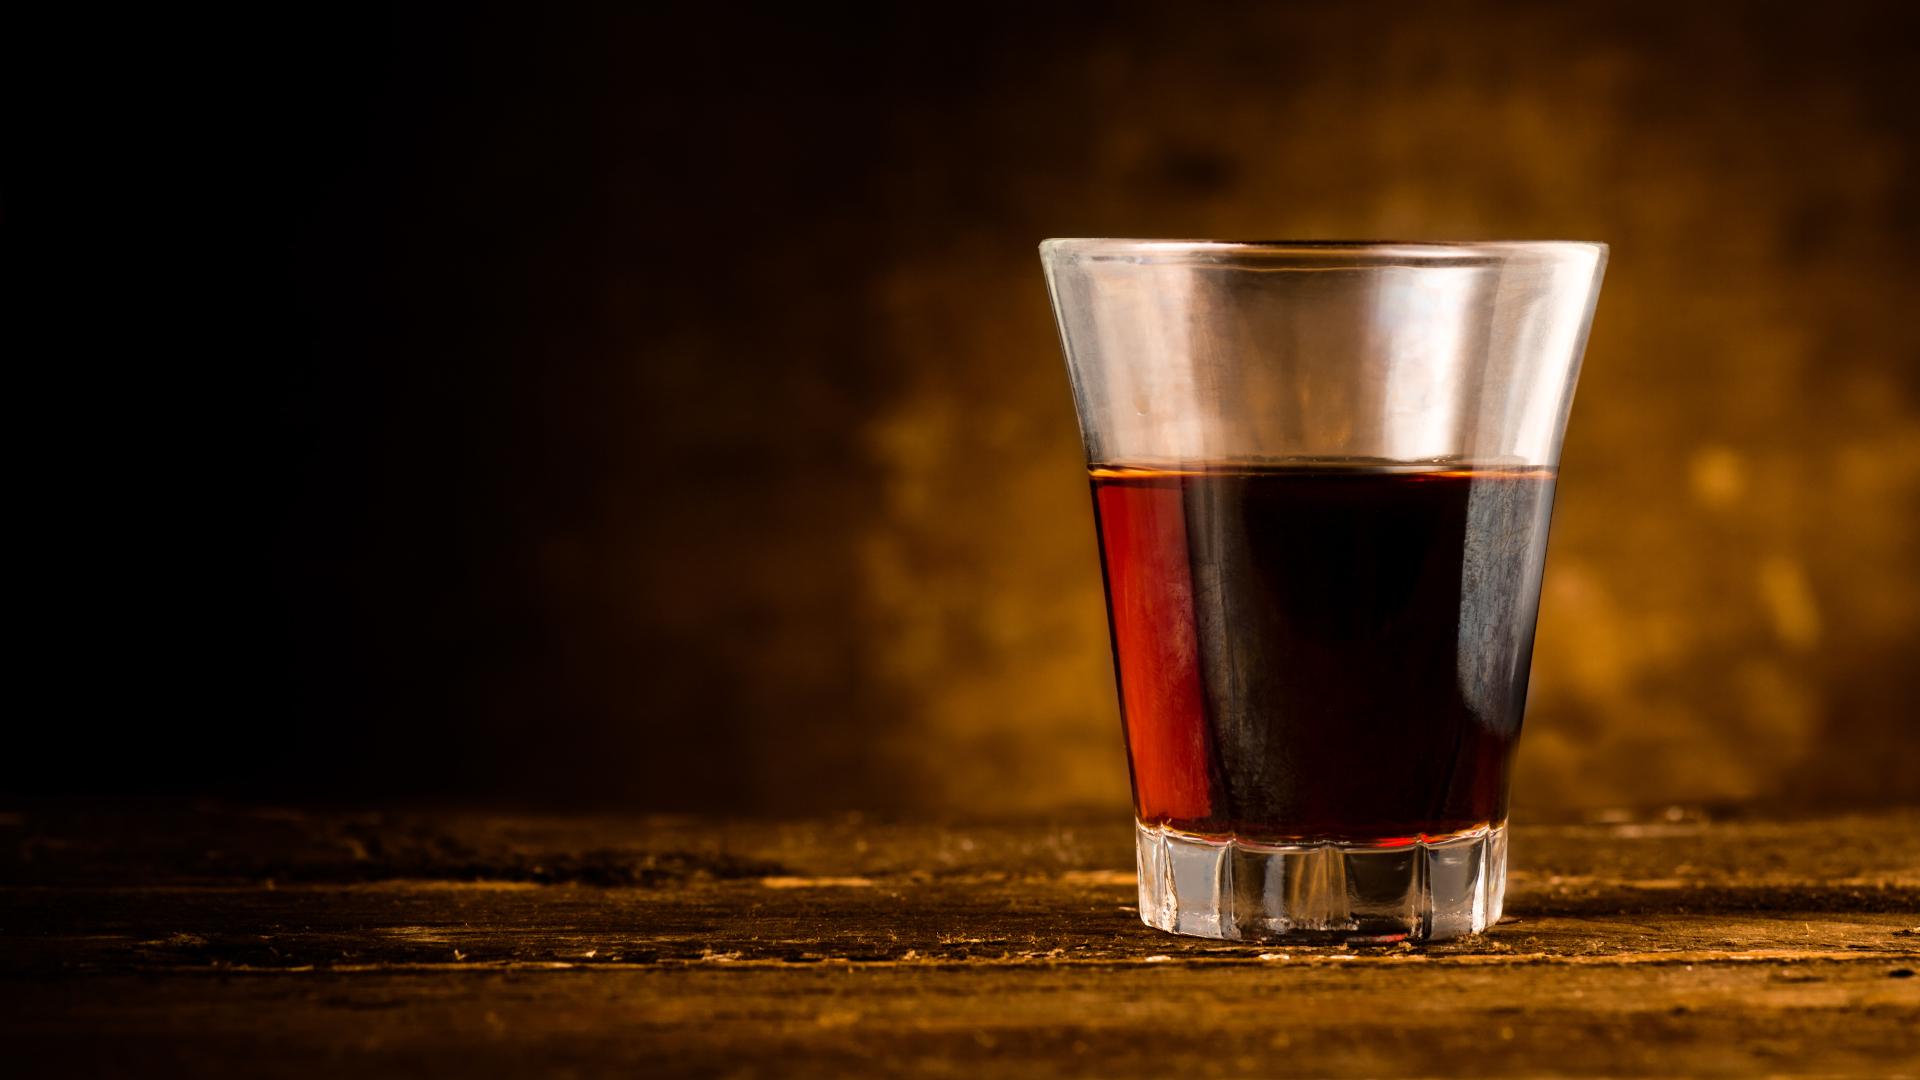 Amaro clementi elixir di Fivizzano